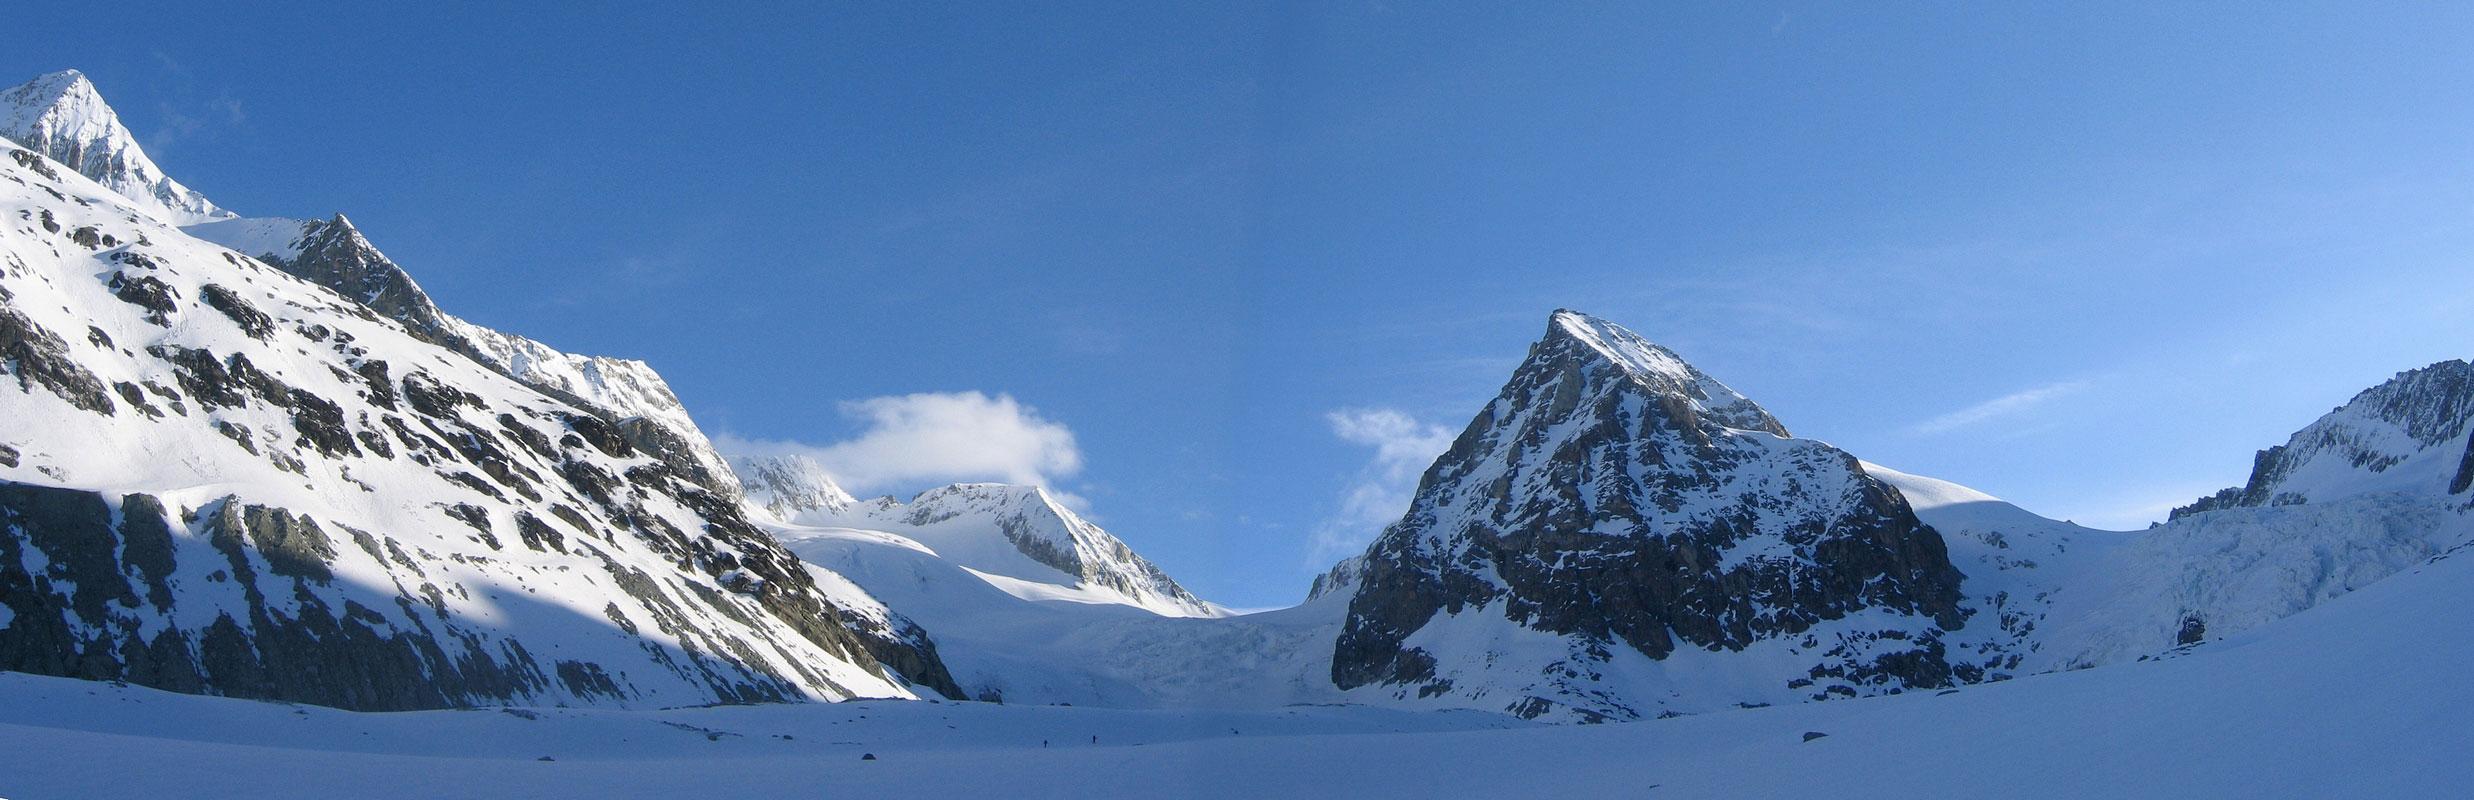 Pigne Arolla, Day 5 H.R. Chamonix-Zermatt Walliser Alpen / Alpes valaisannes Švýcarsko panorama 27